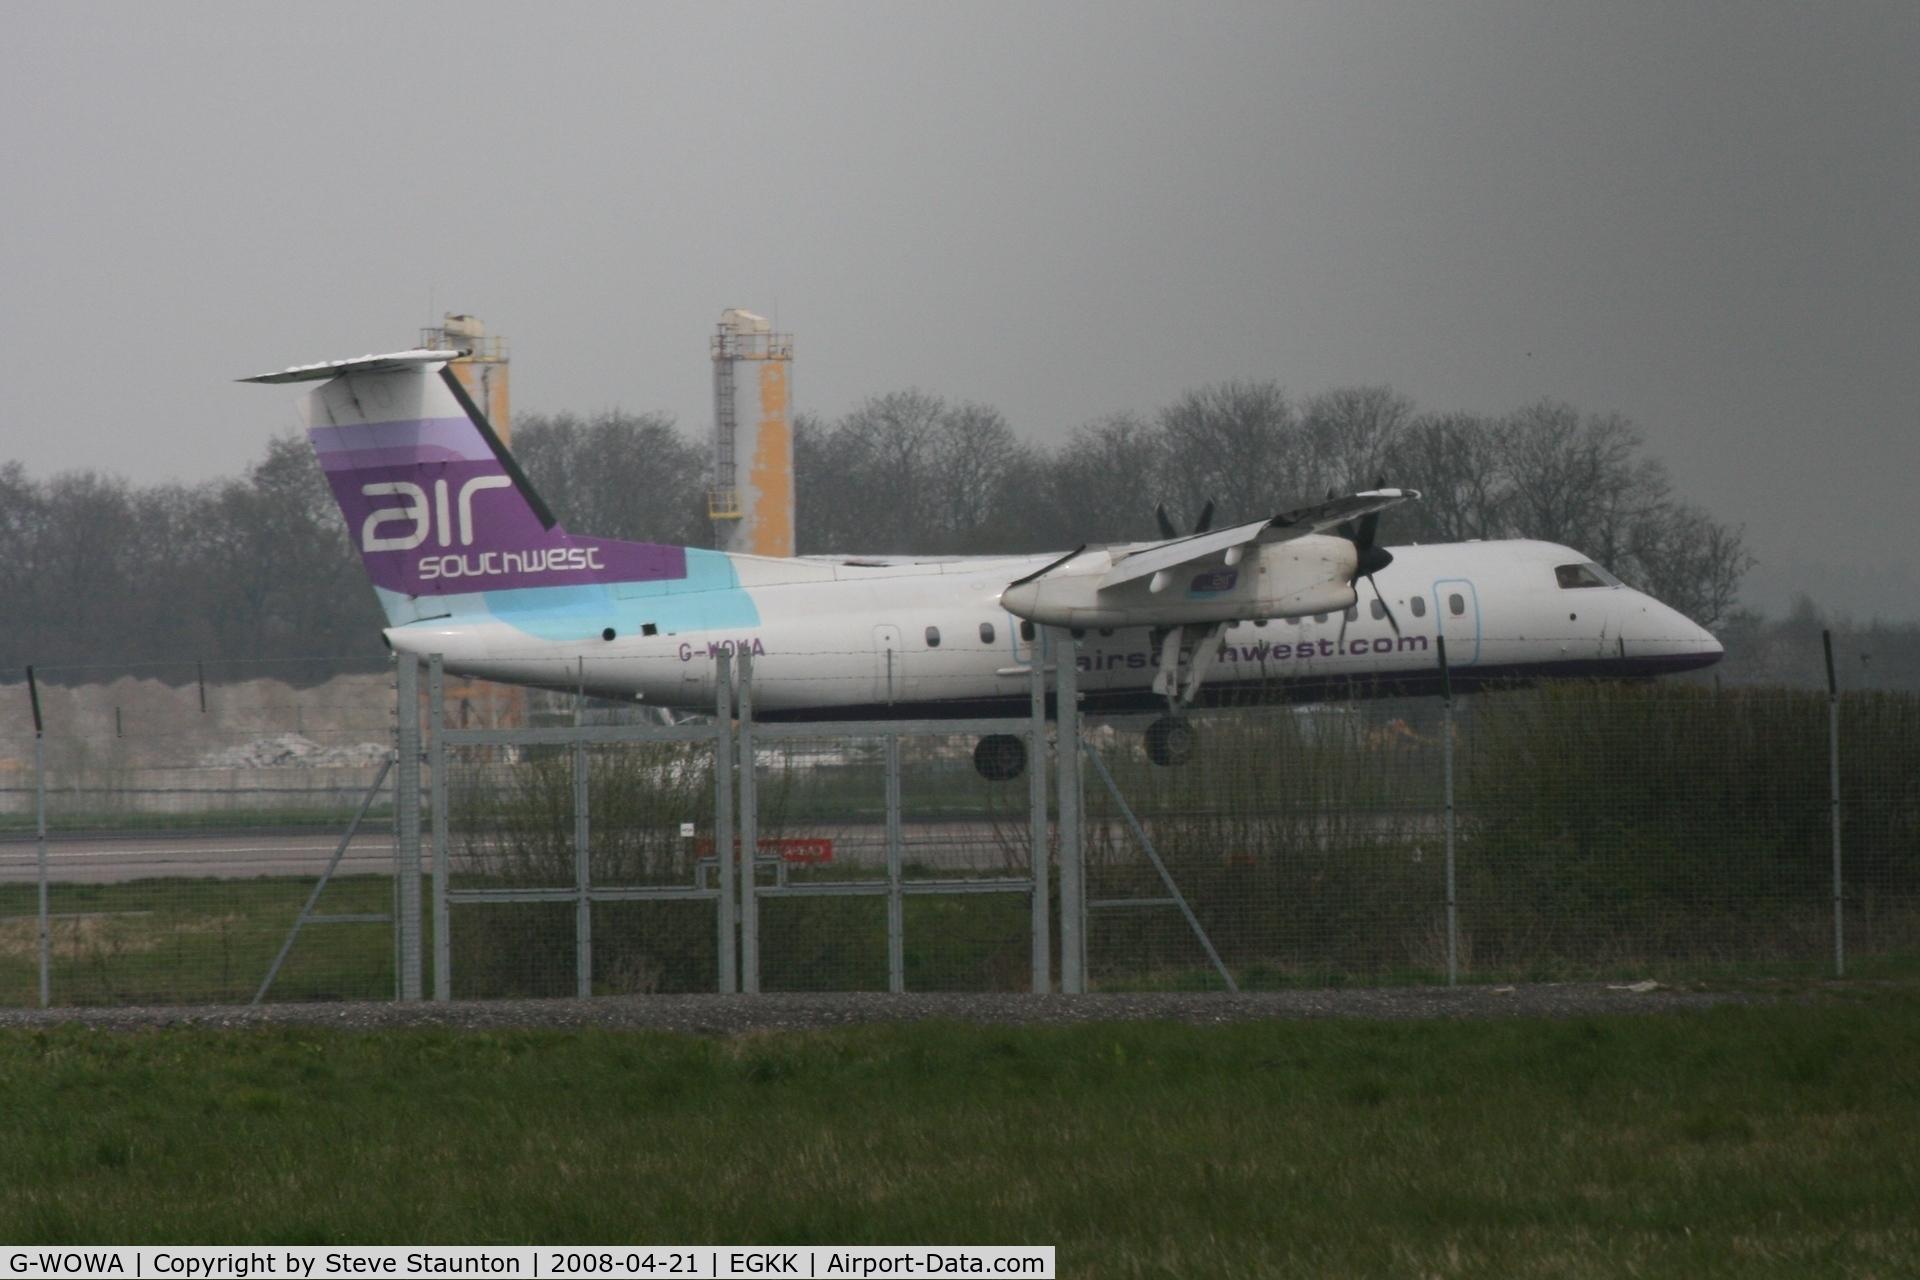 G-WOWA, 1992 De Havilland Canada DHC-8-311 Dash 8 C/N 296, Gatwick Airport 21/04/08 (married 19/04/08 - spotting two days later)